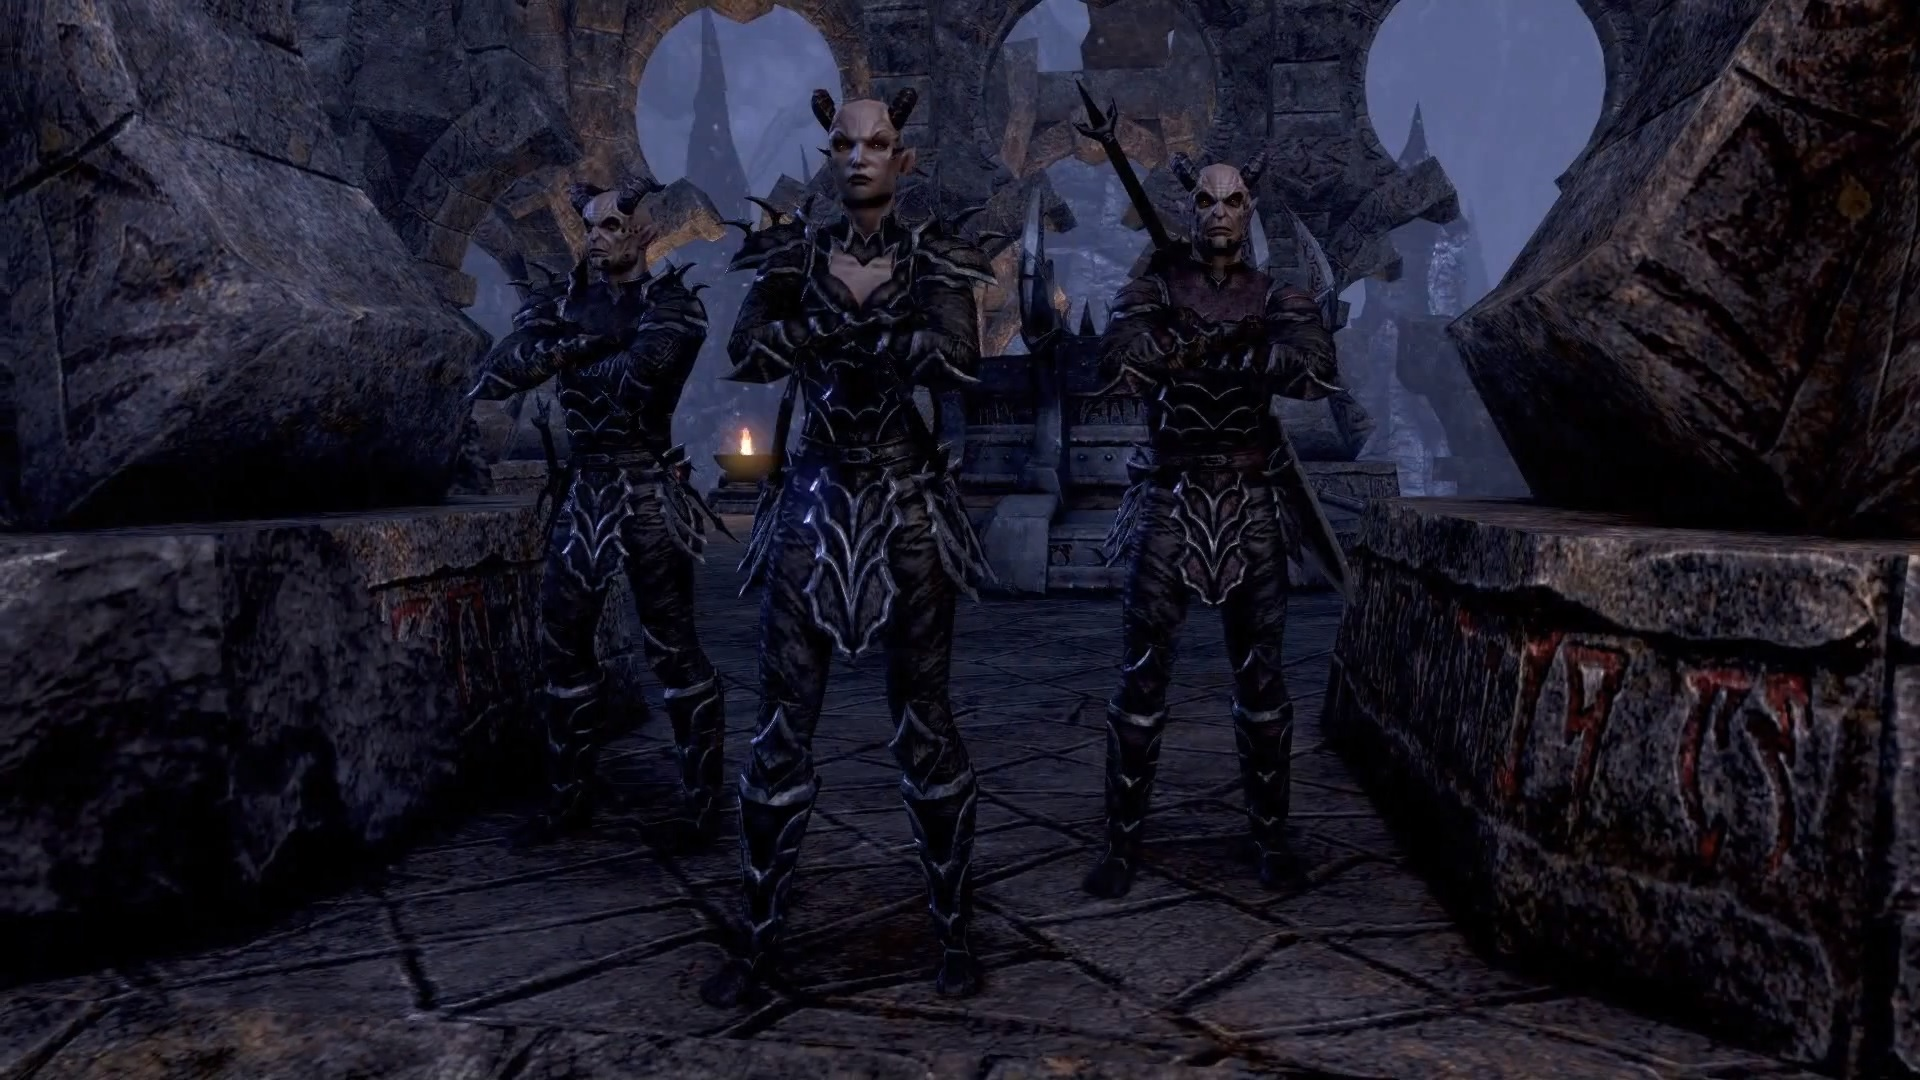 Daedric Armor Dremora (Online) - The...